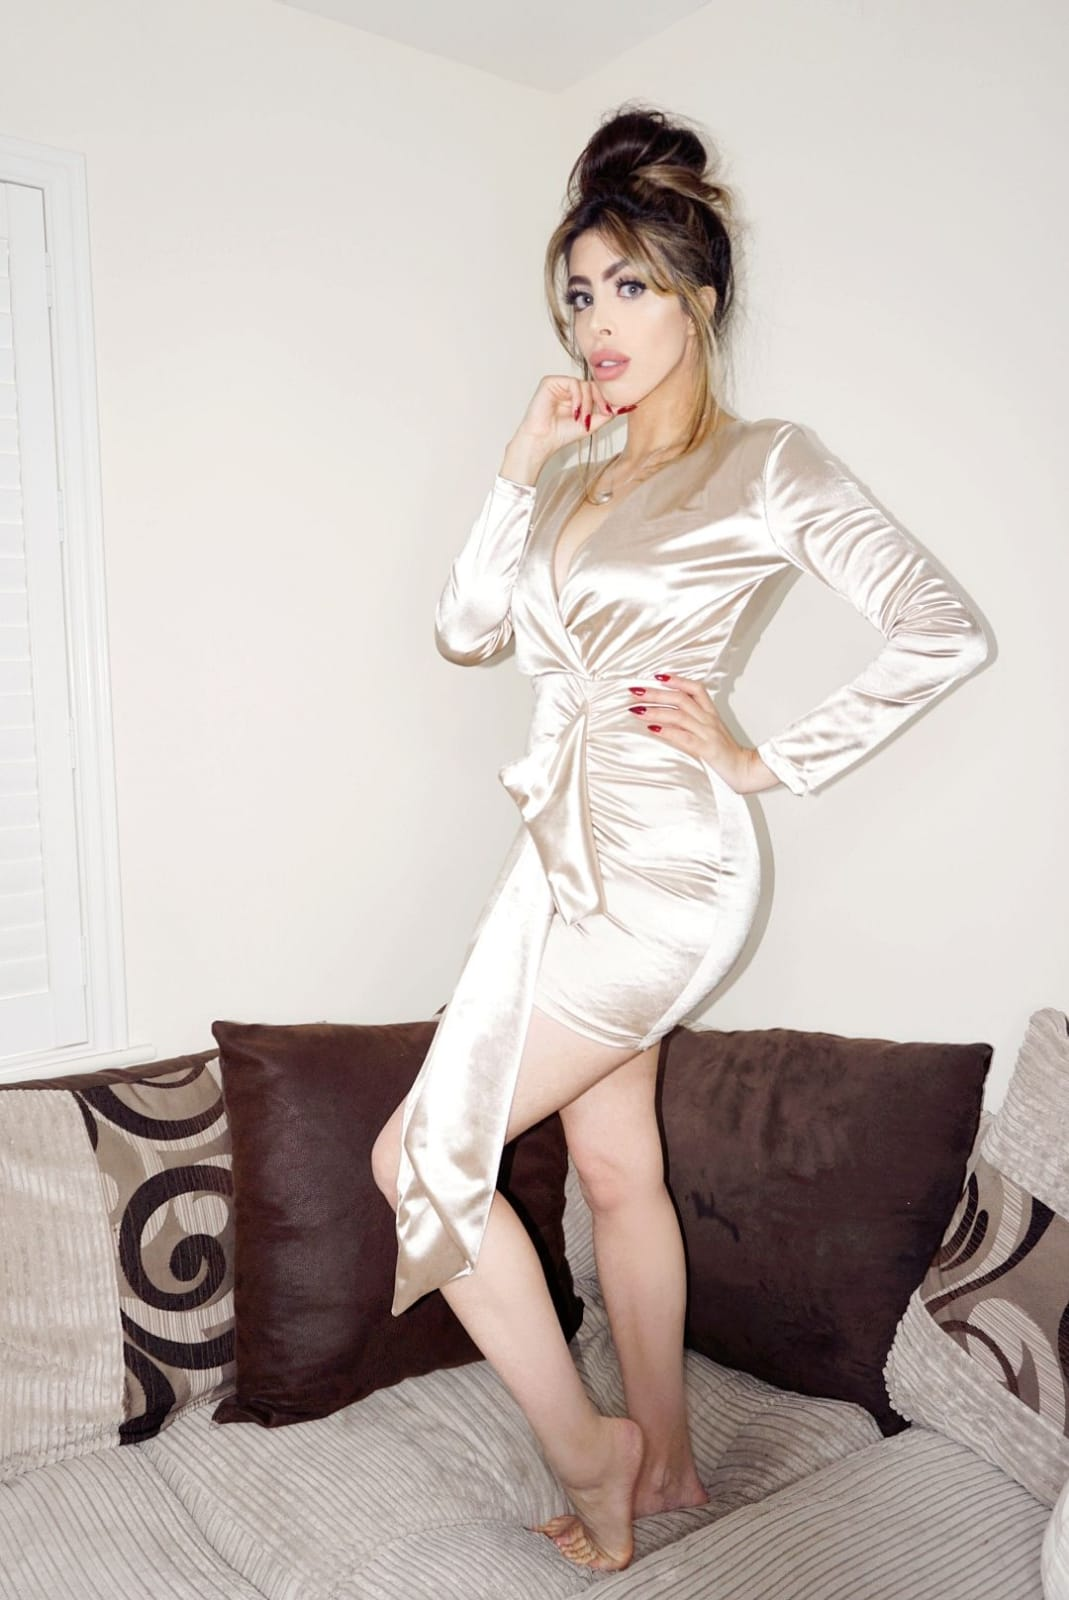 The Femme Luxe Gold Bodycon Side Detail Mini Dress in model Joanna